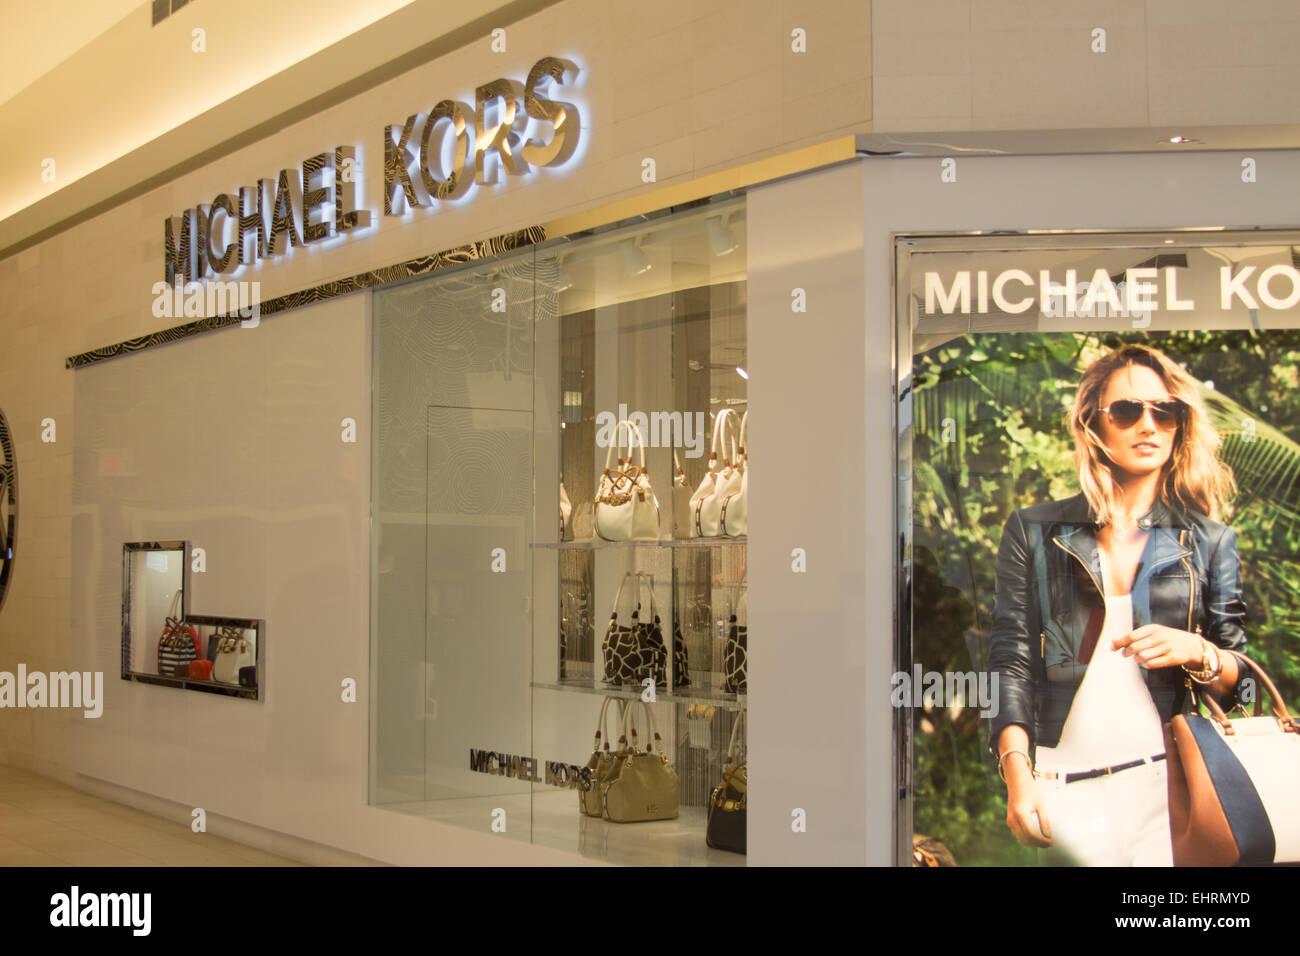 michael kors outlet s